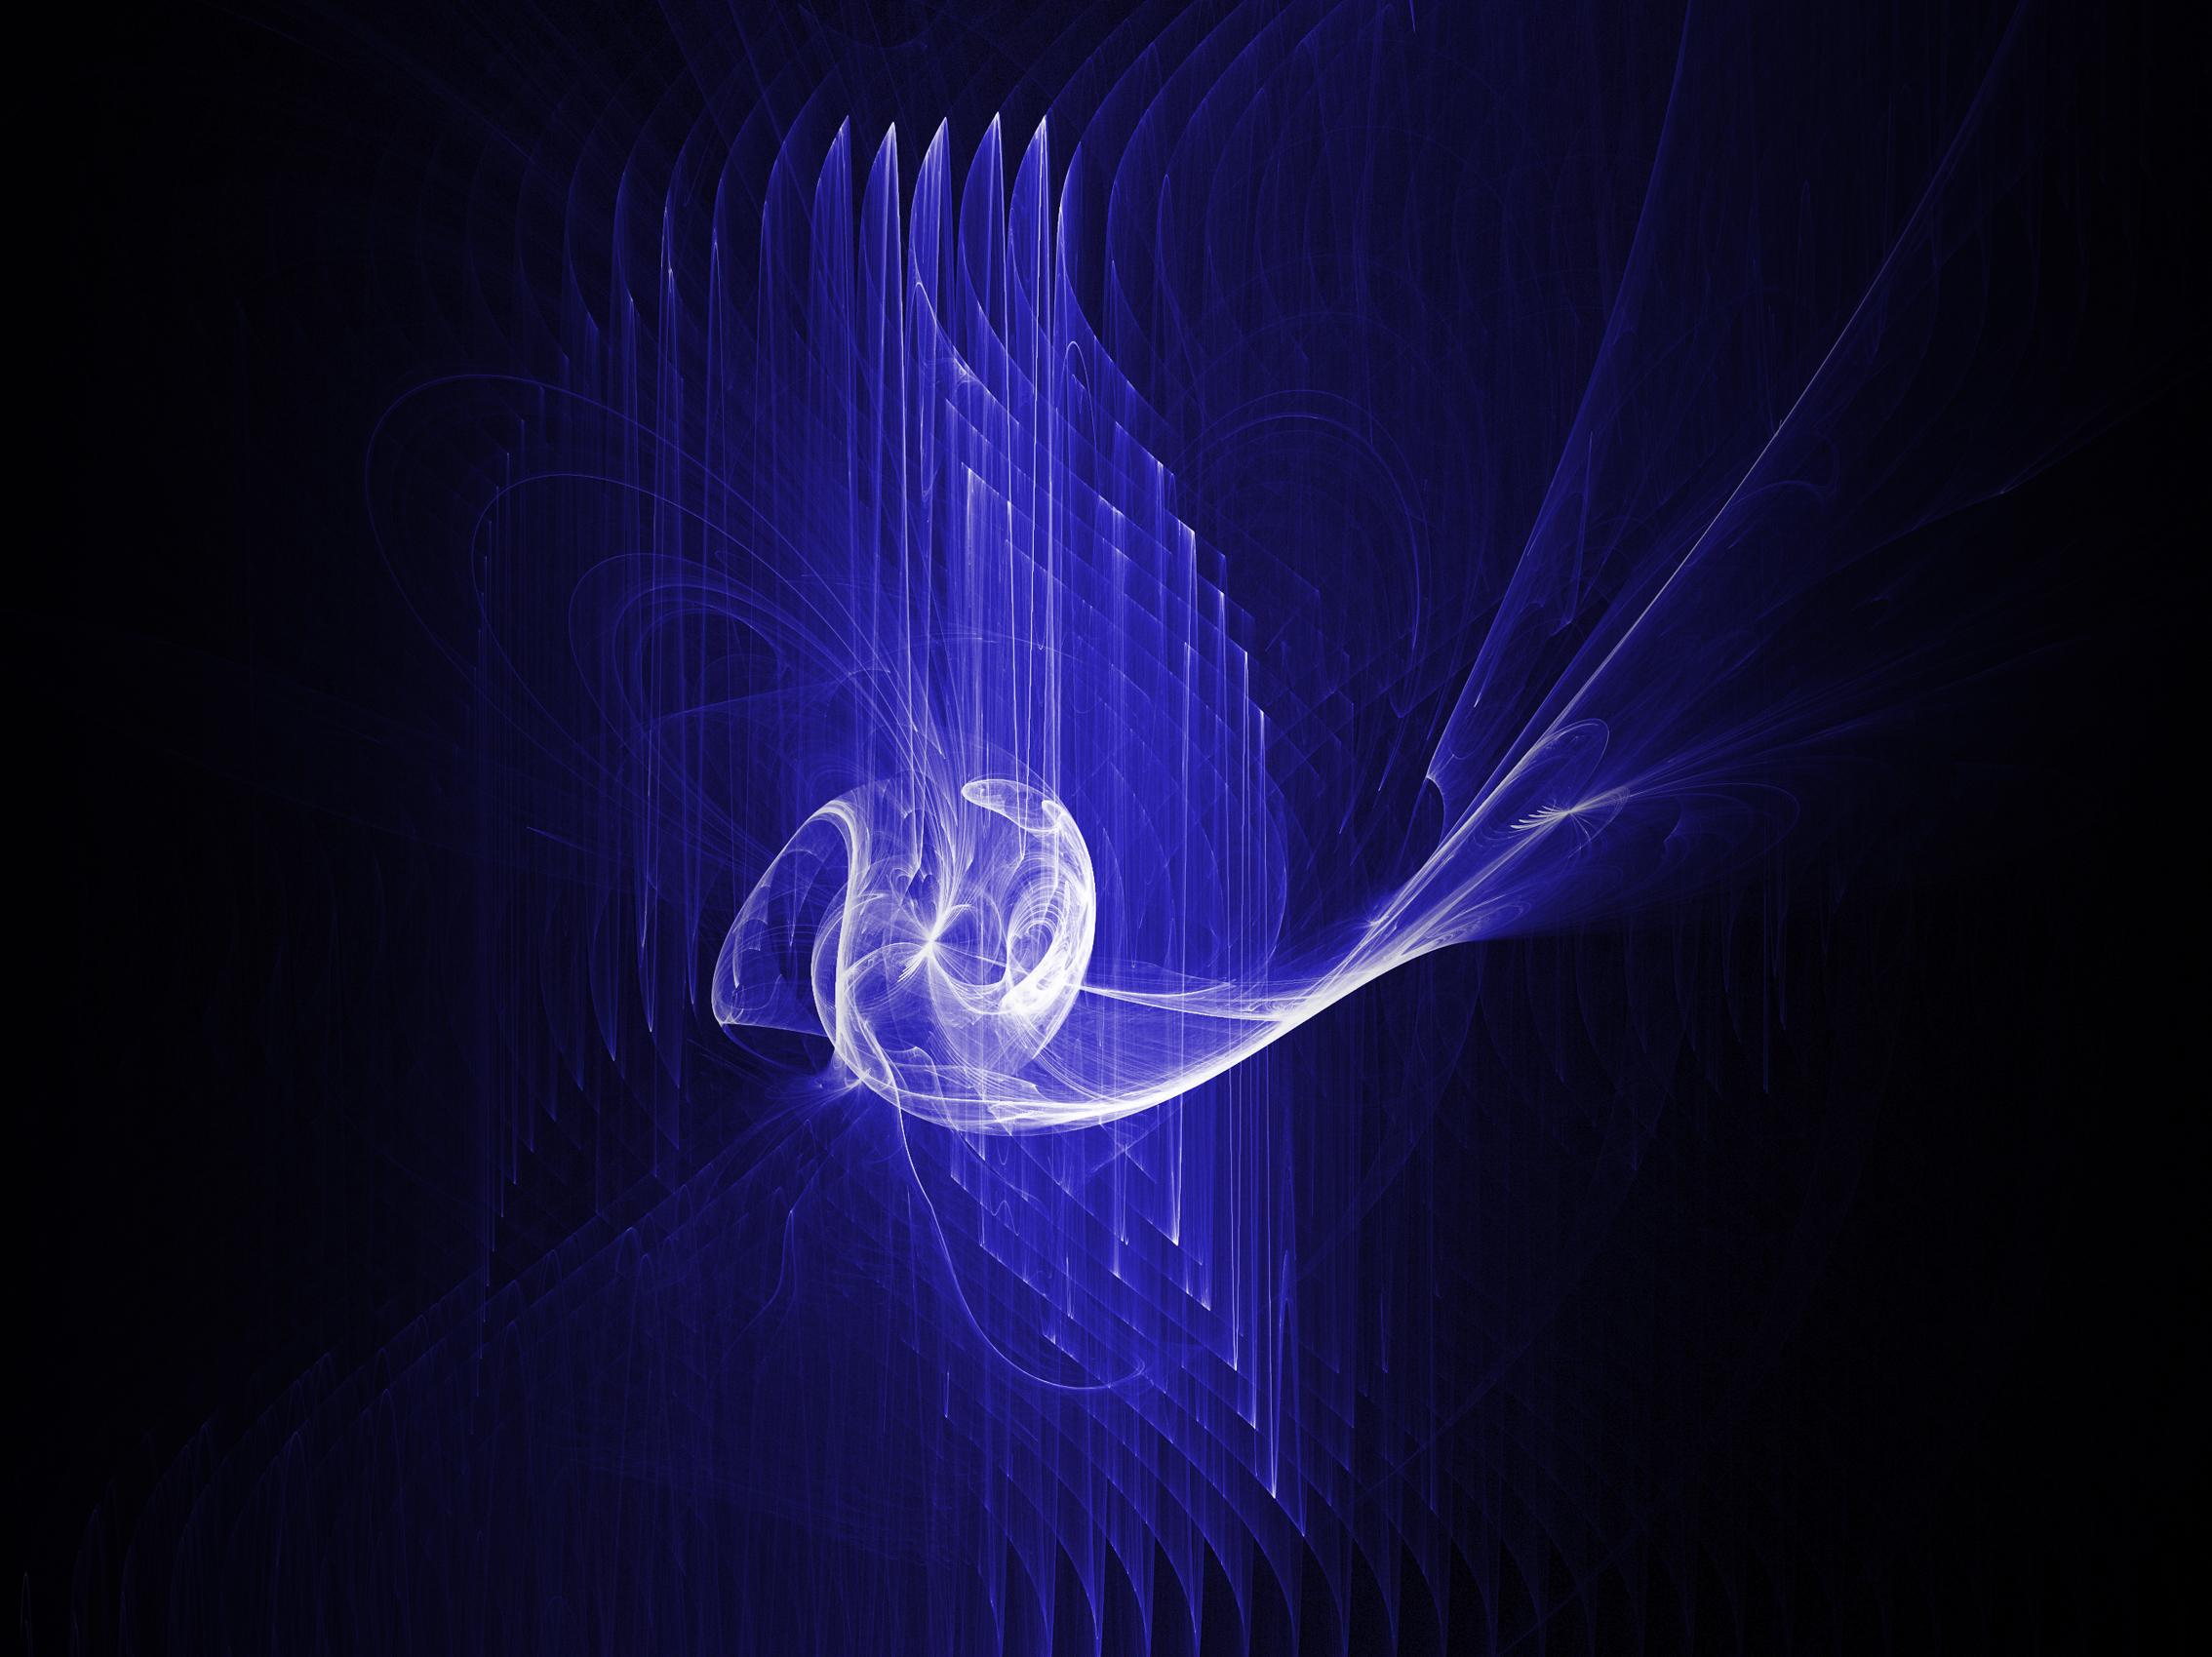 Blue Phaze